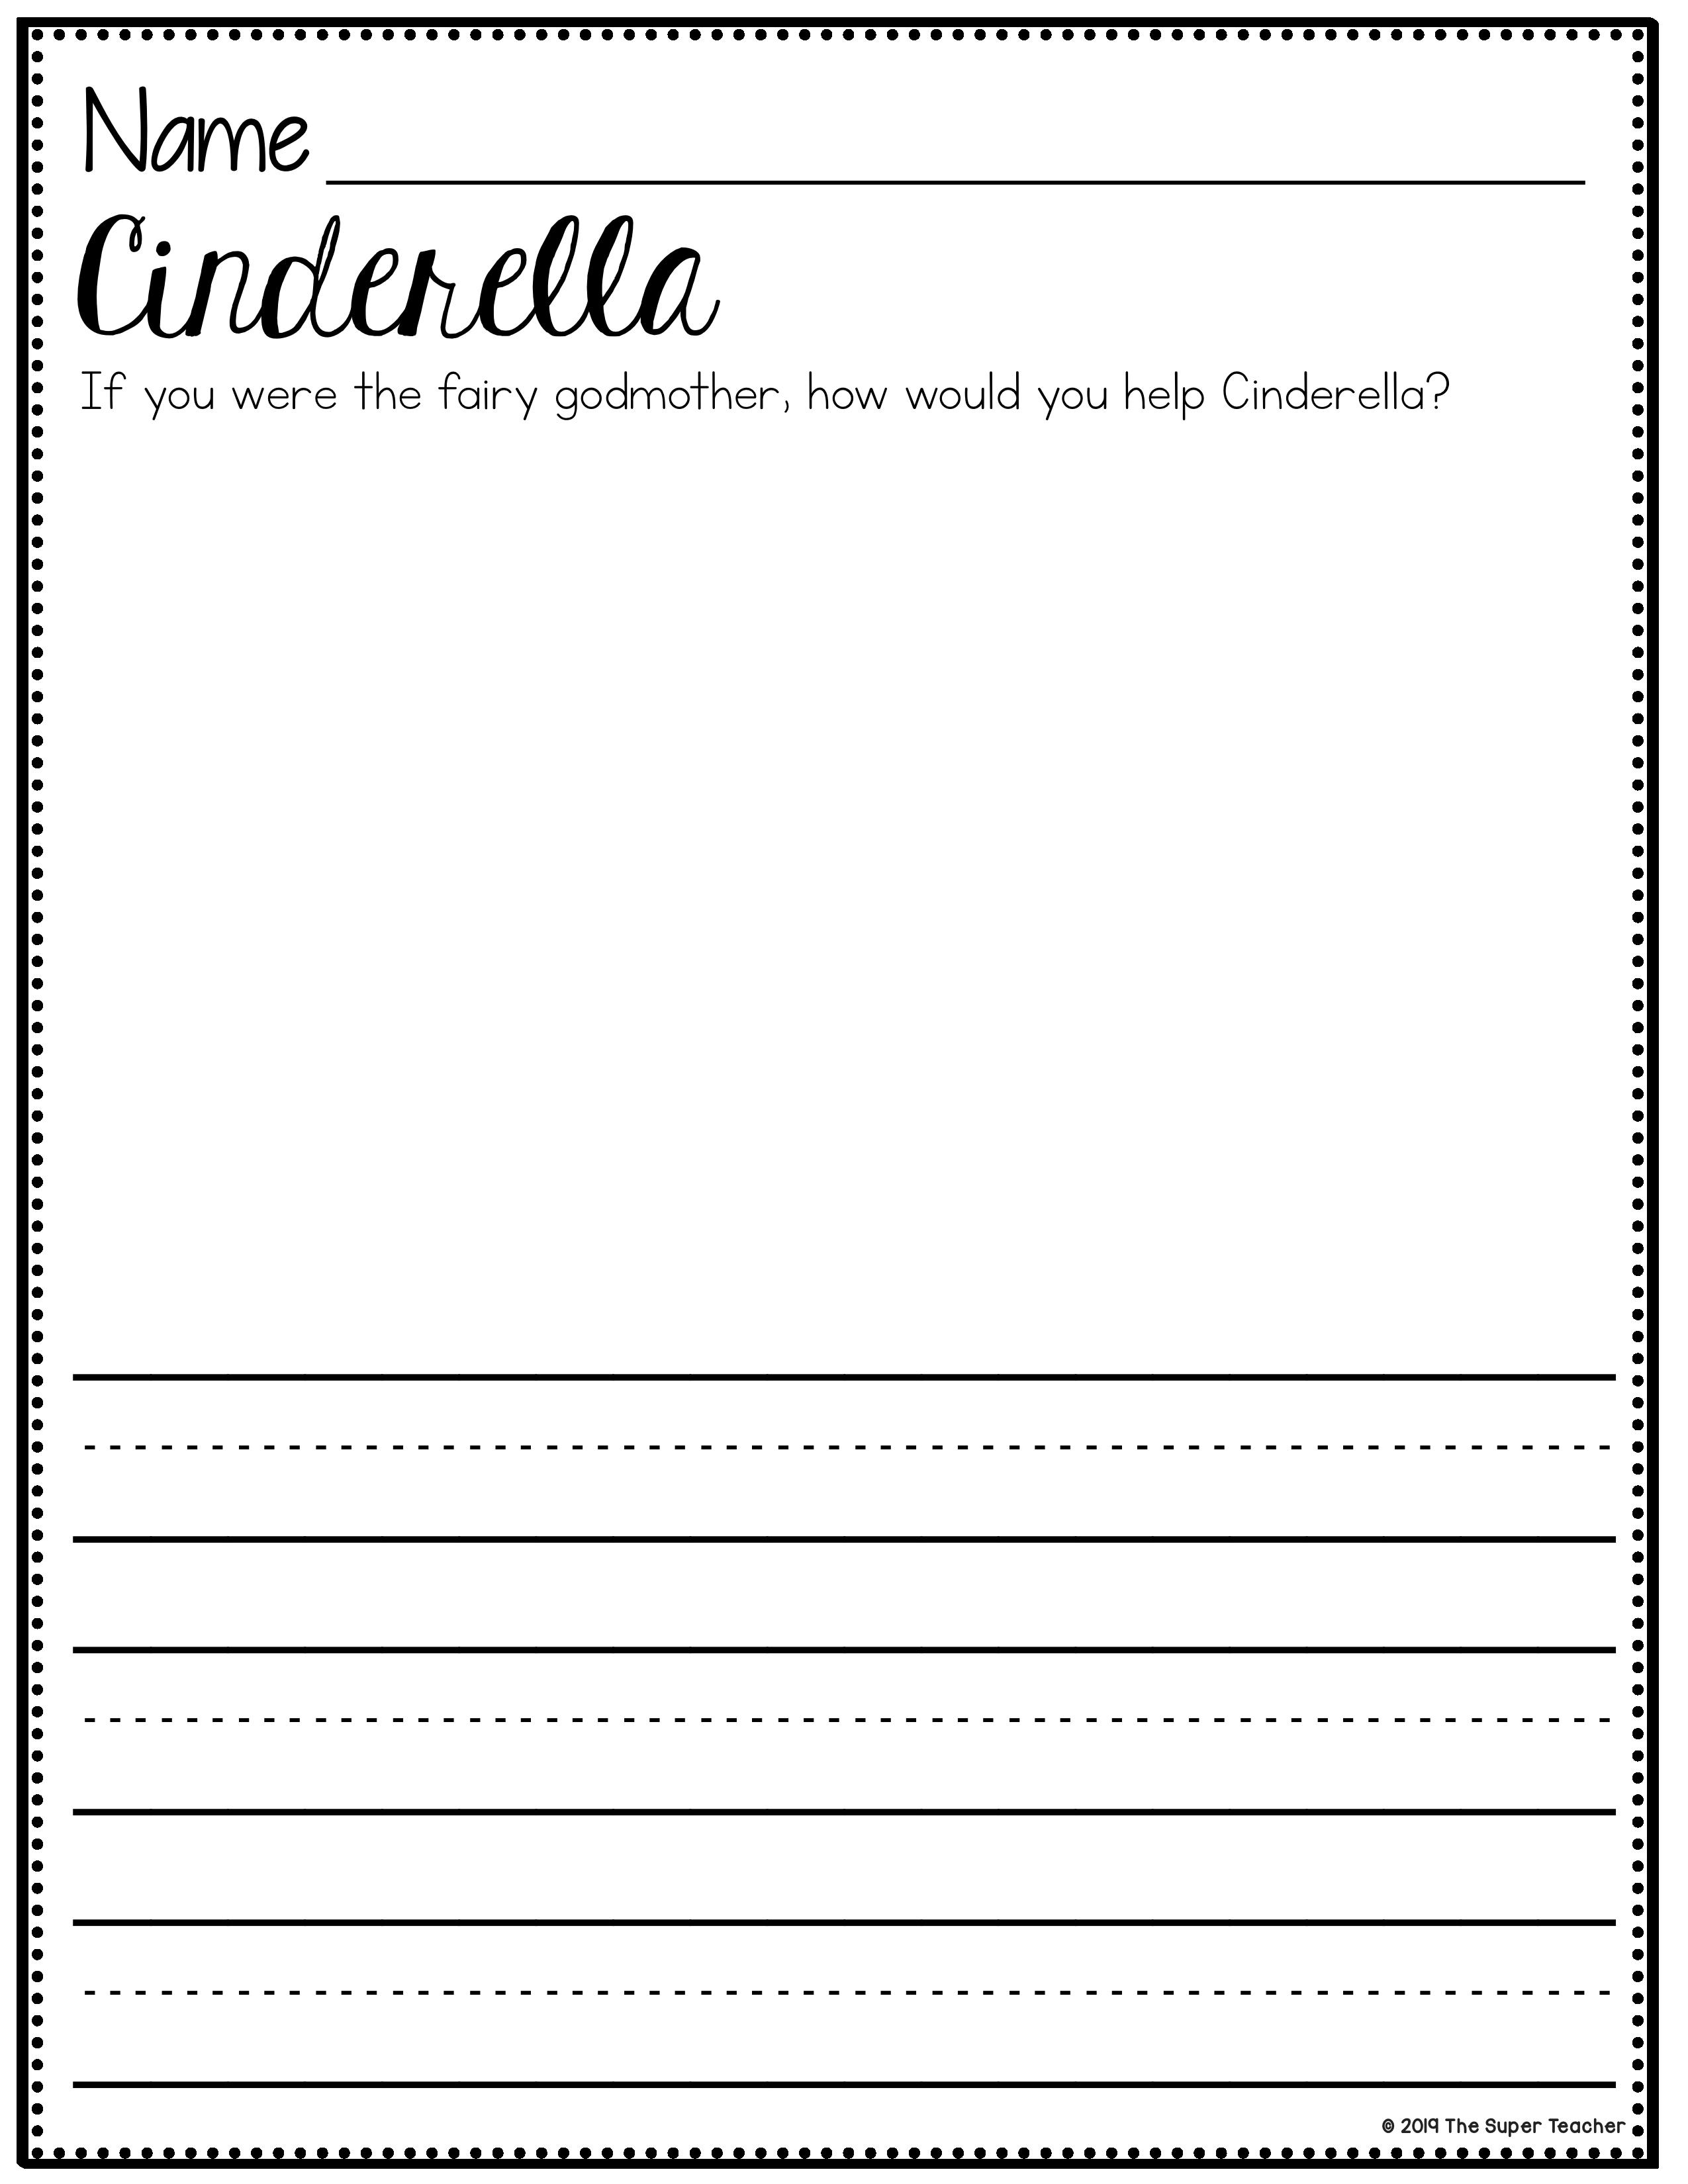 Cinderella writing paper creative writing ubc